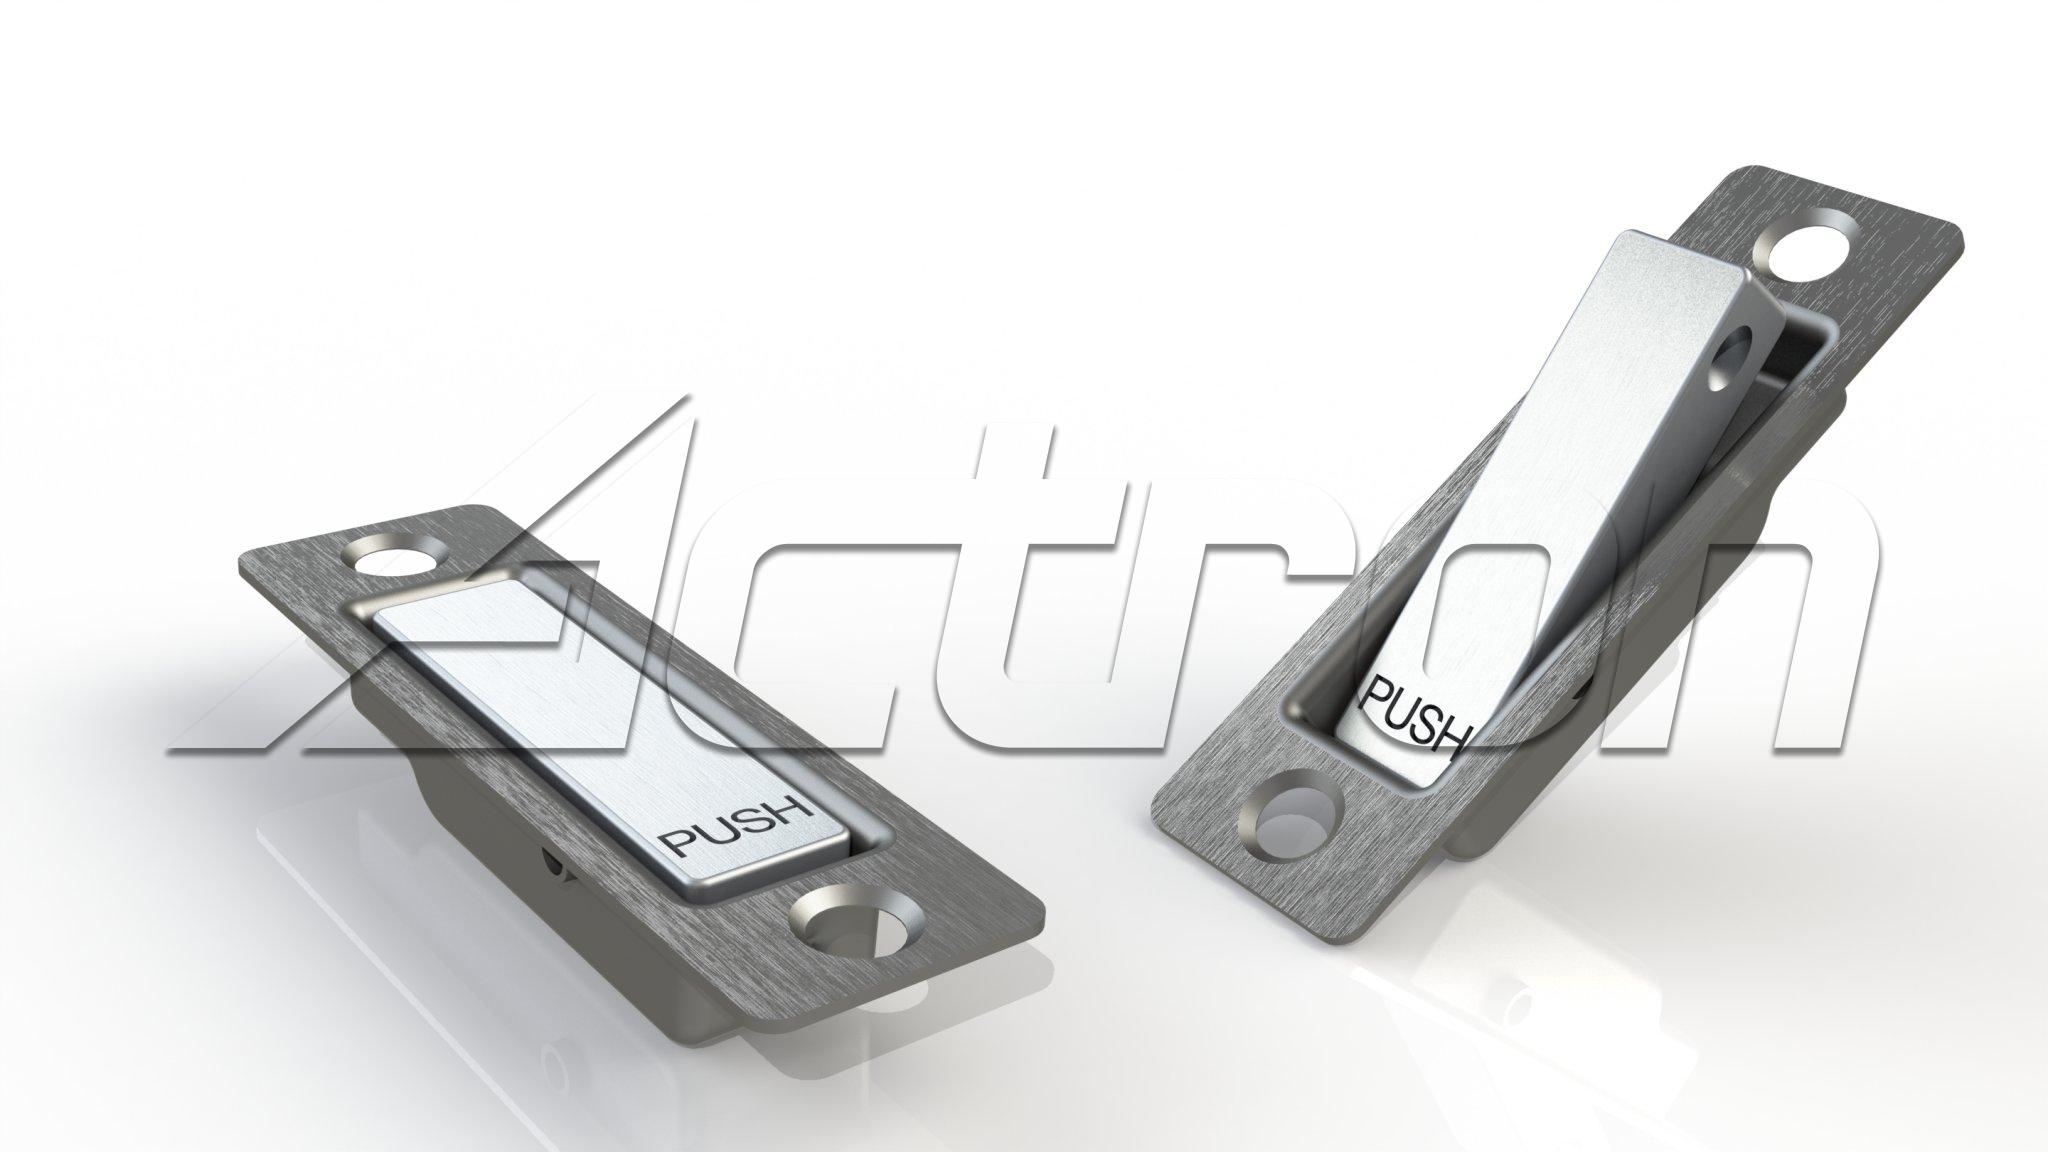 latch-assy-8211-retainer-w-padlock-provision-4719-a35007.jpg